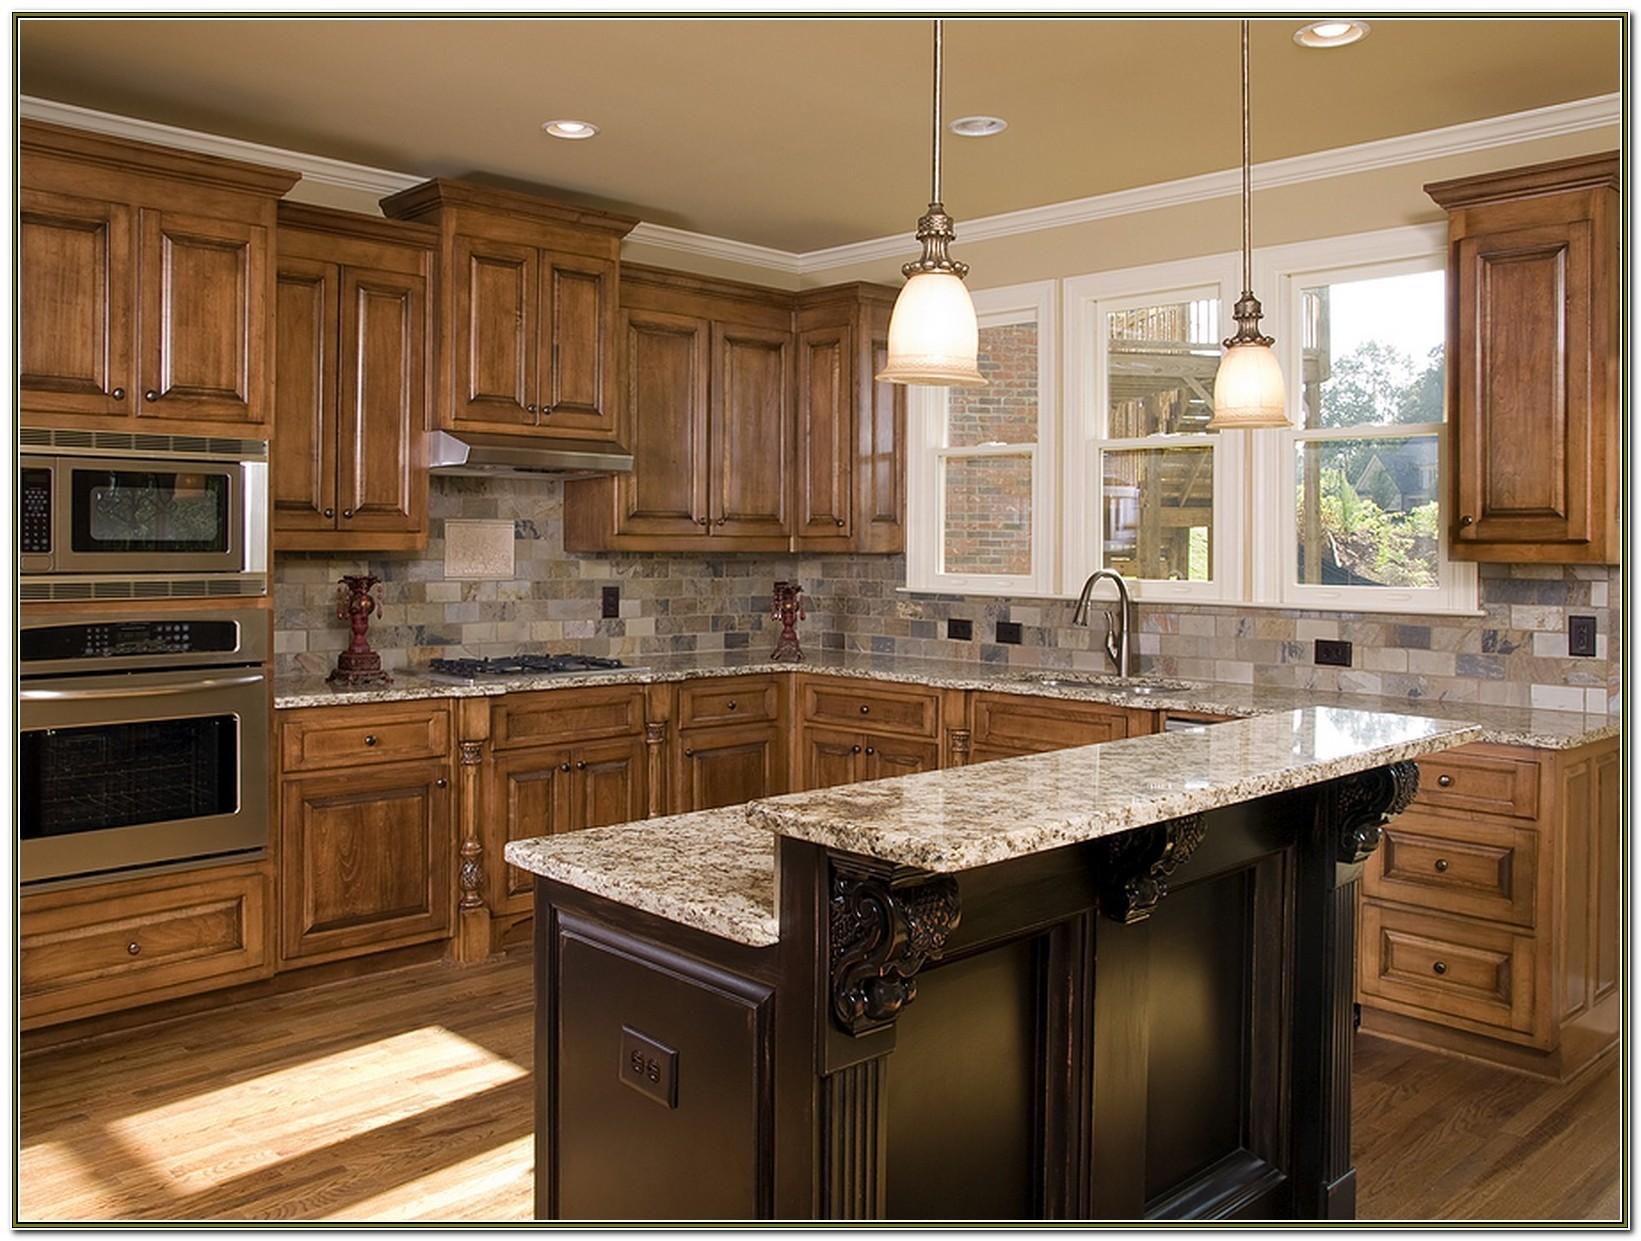 Menards Kitchen Cabinets In Stock - Cabinet : Home Design ...